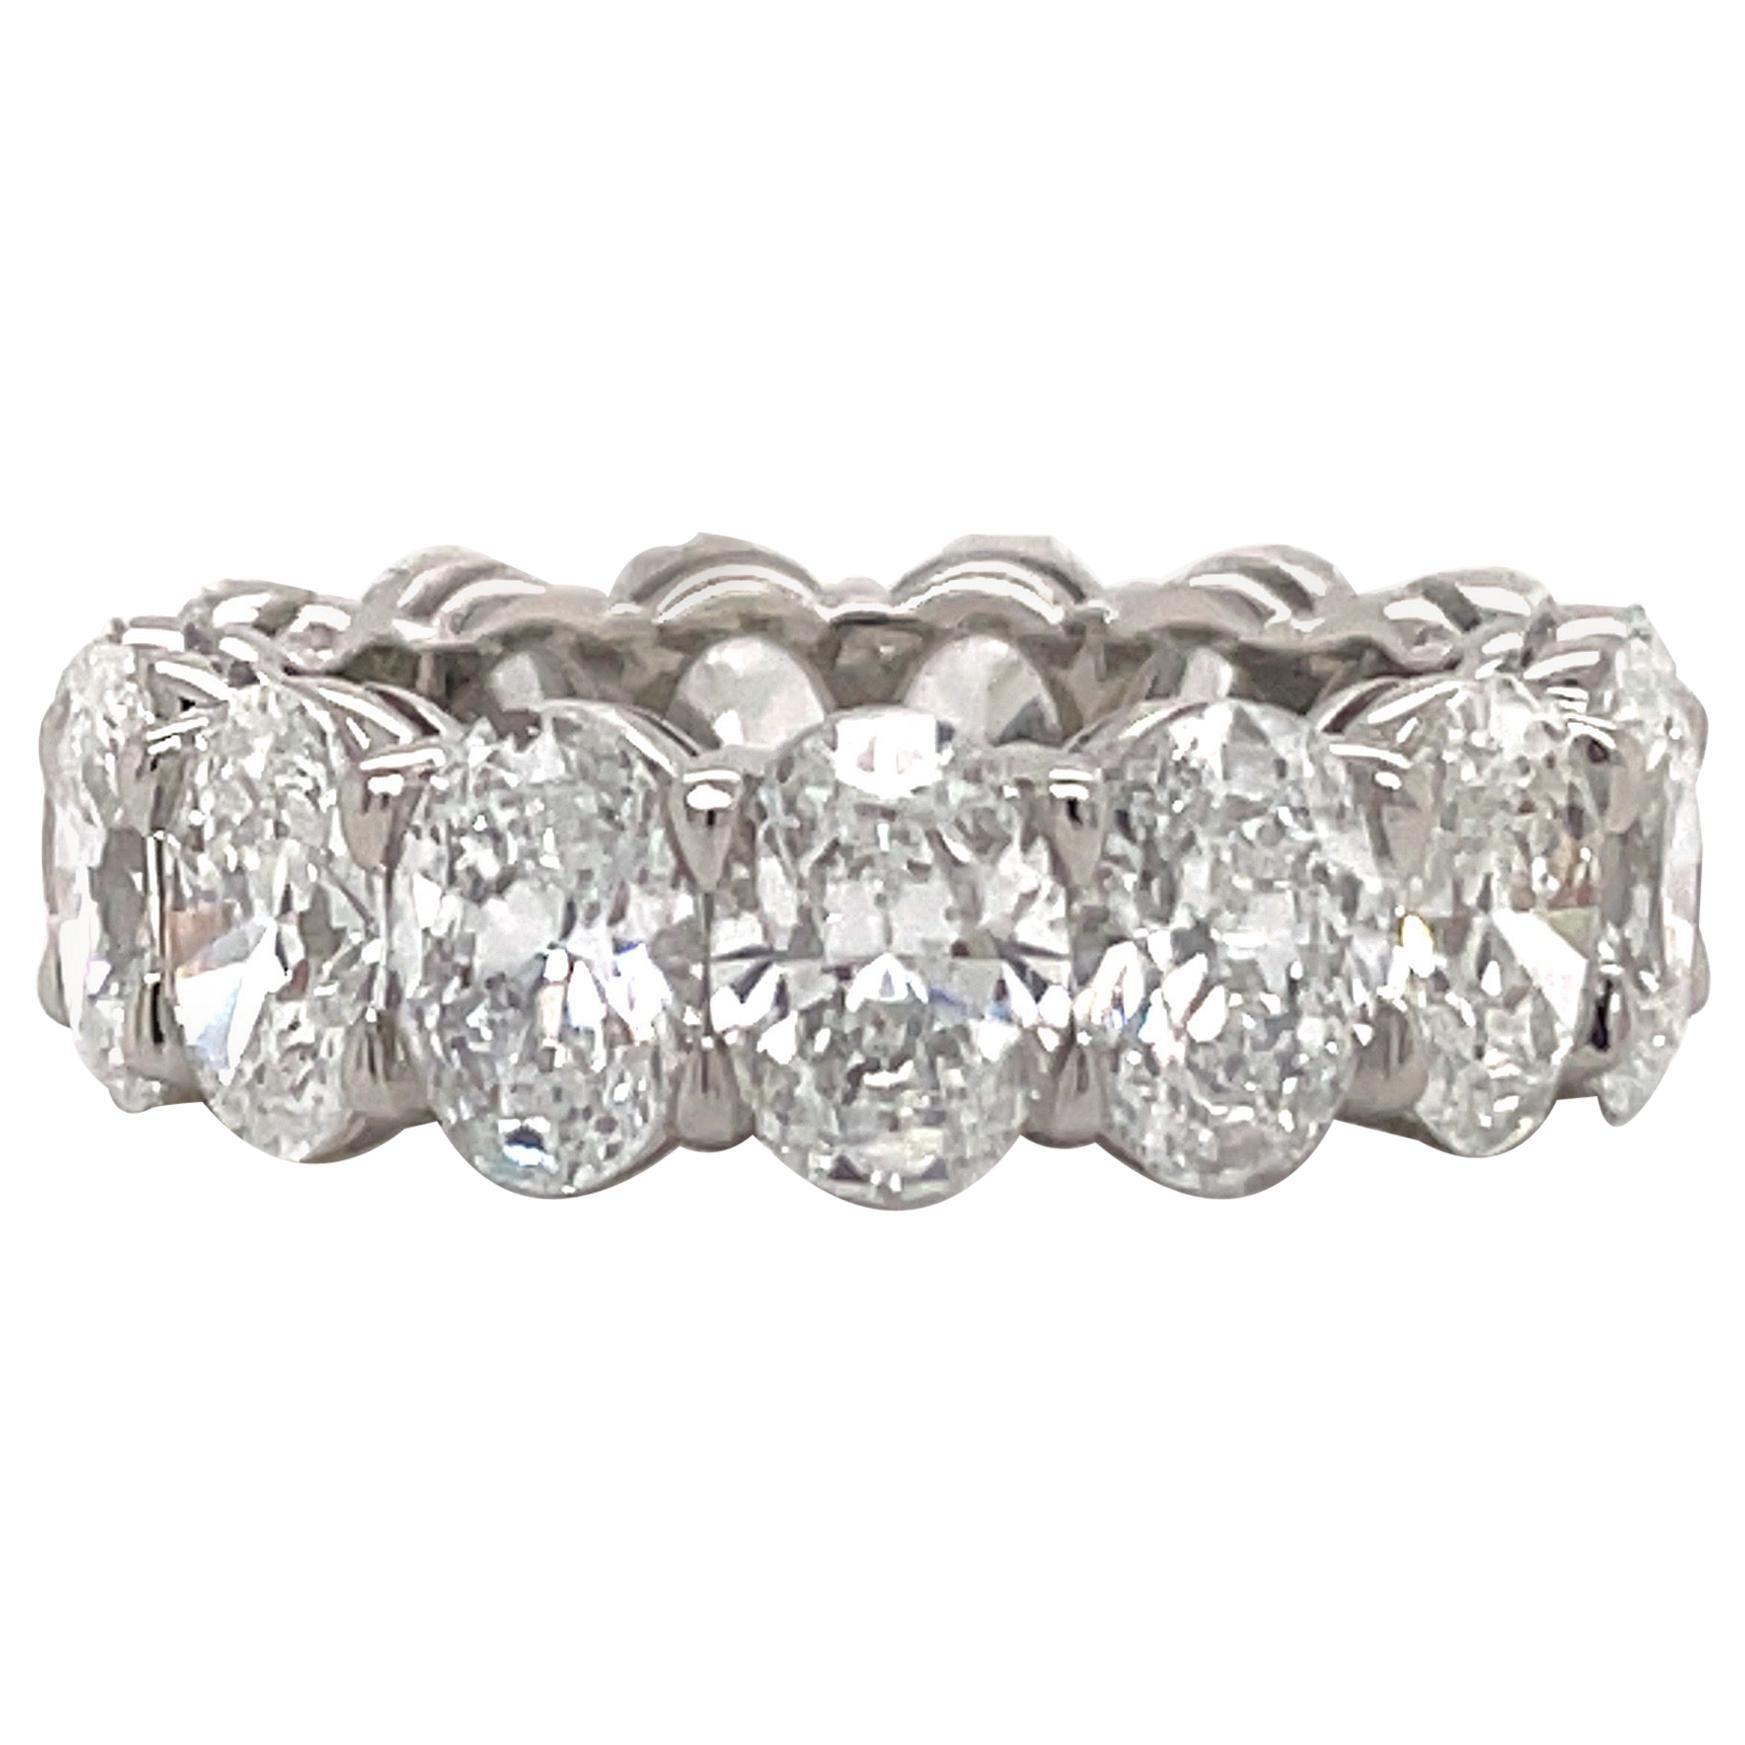 GIA Certified Oval Cut Diamond Wedding Band 7.64 Carats D-F VVS-VS Platinum